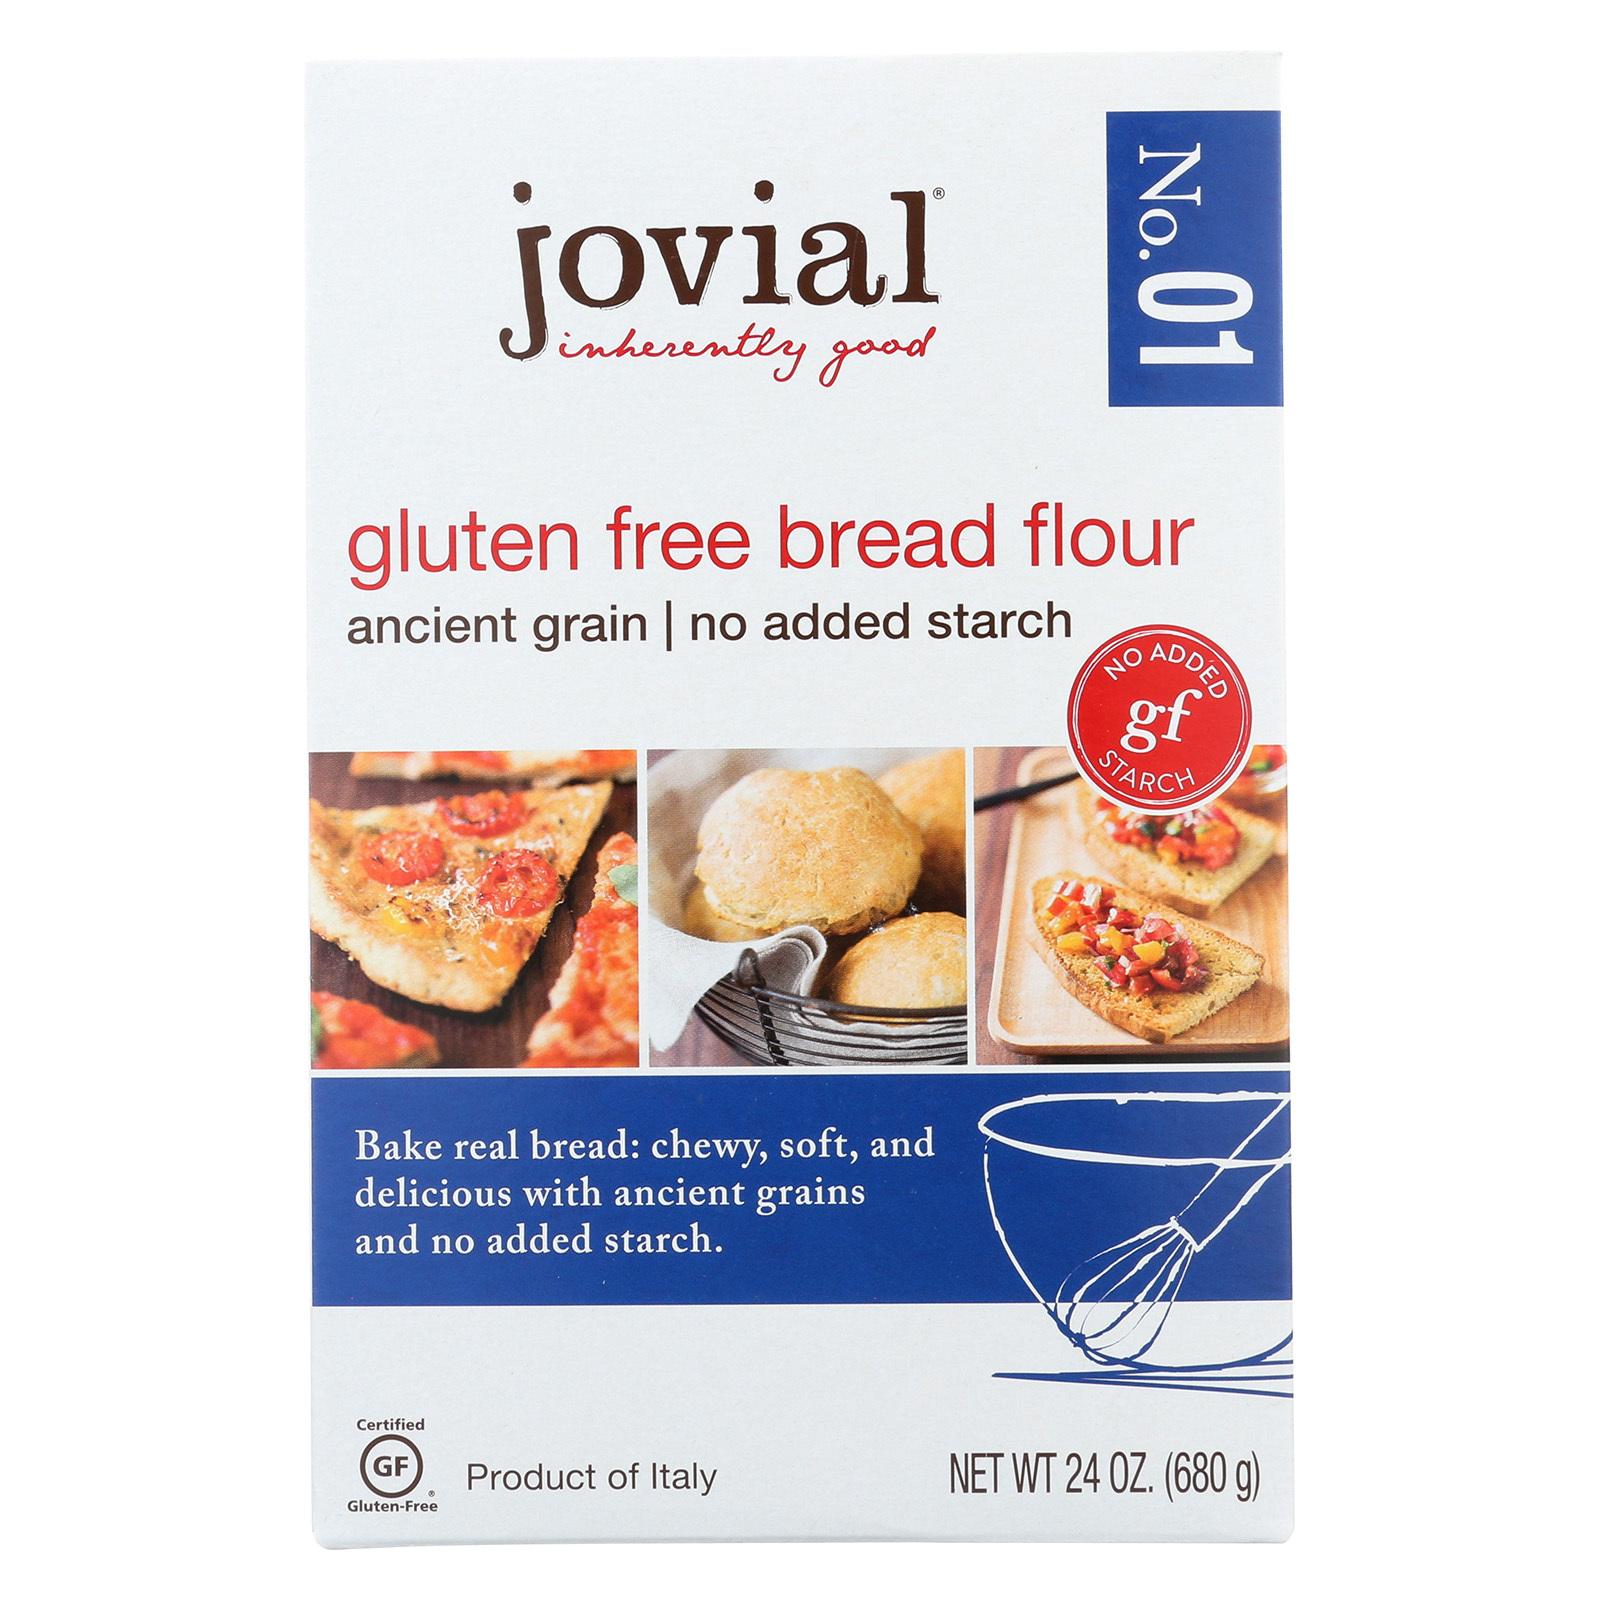 Jovial 1 Gluten Free Bread Flour - Case of 6 - 24 oz.